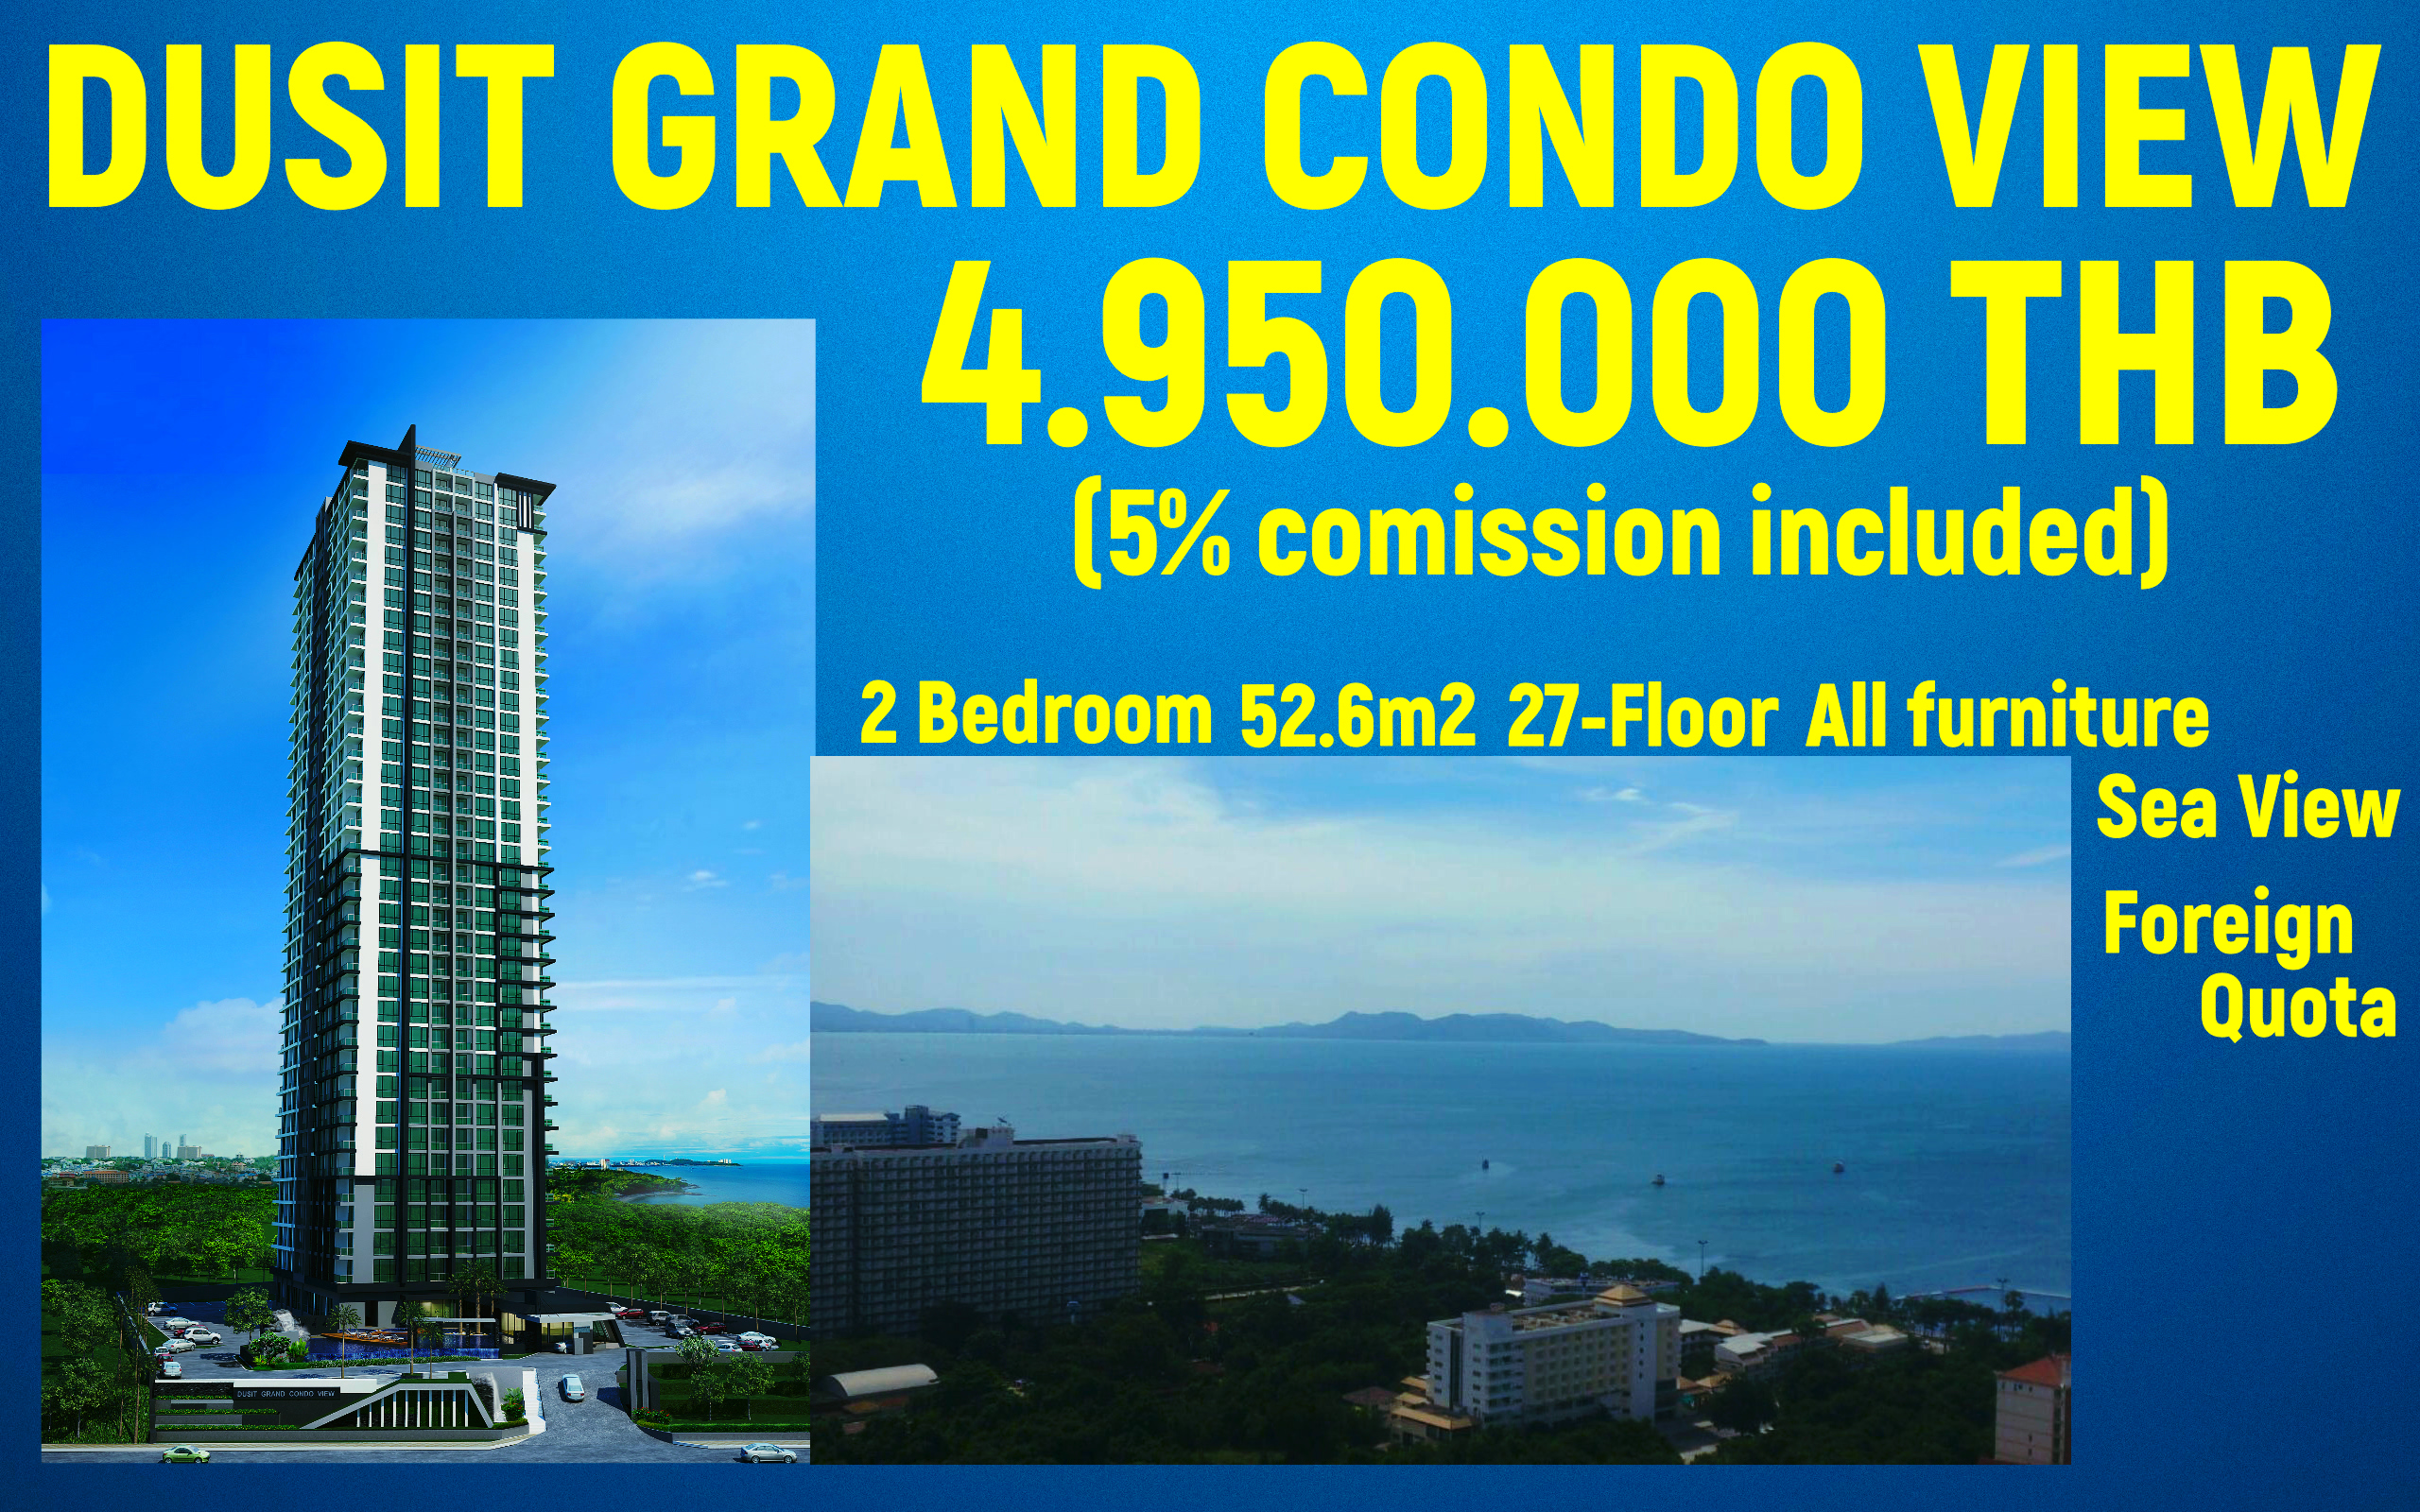 The Dusit Grand Condo View, Jomtien Pattaya.